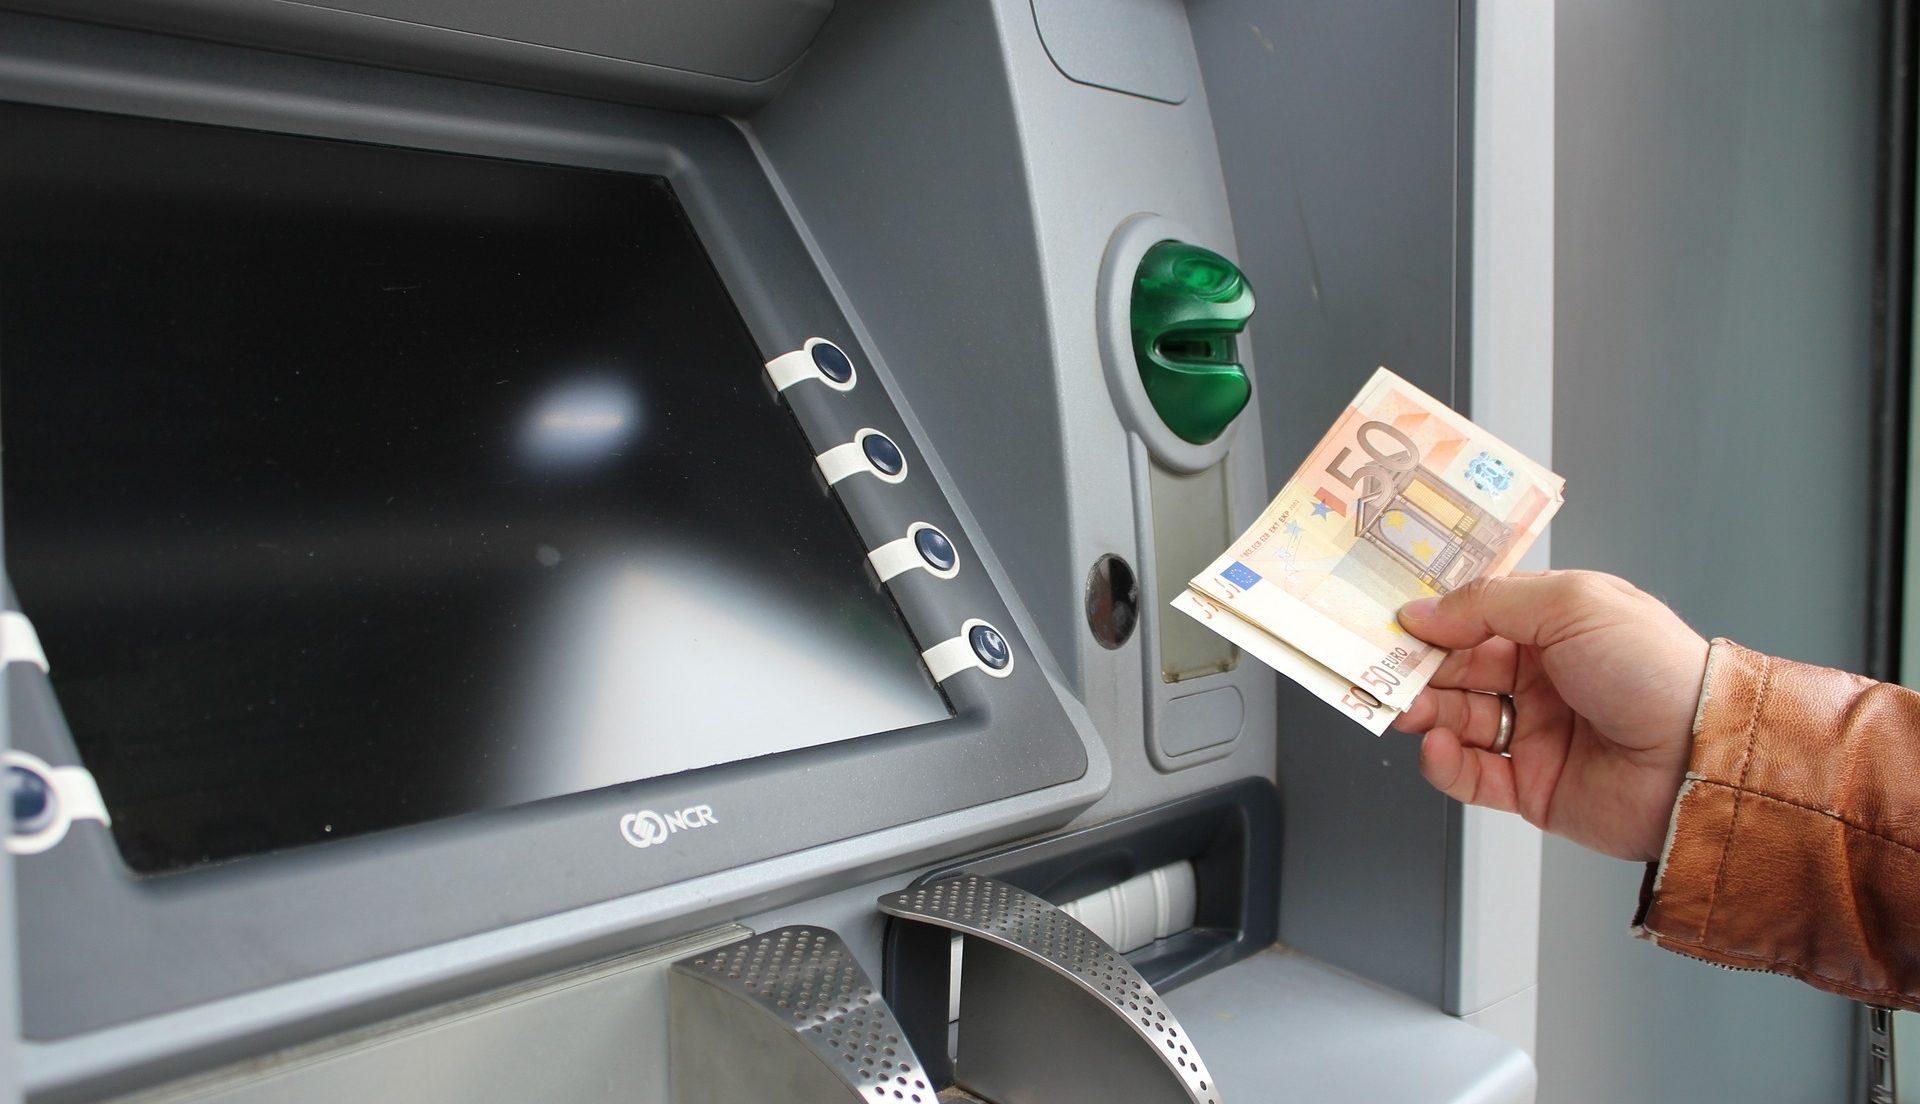 TF Bank Kreditkarte Geld abheben